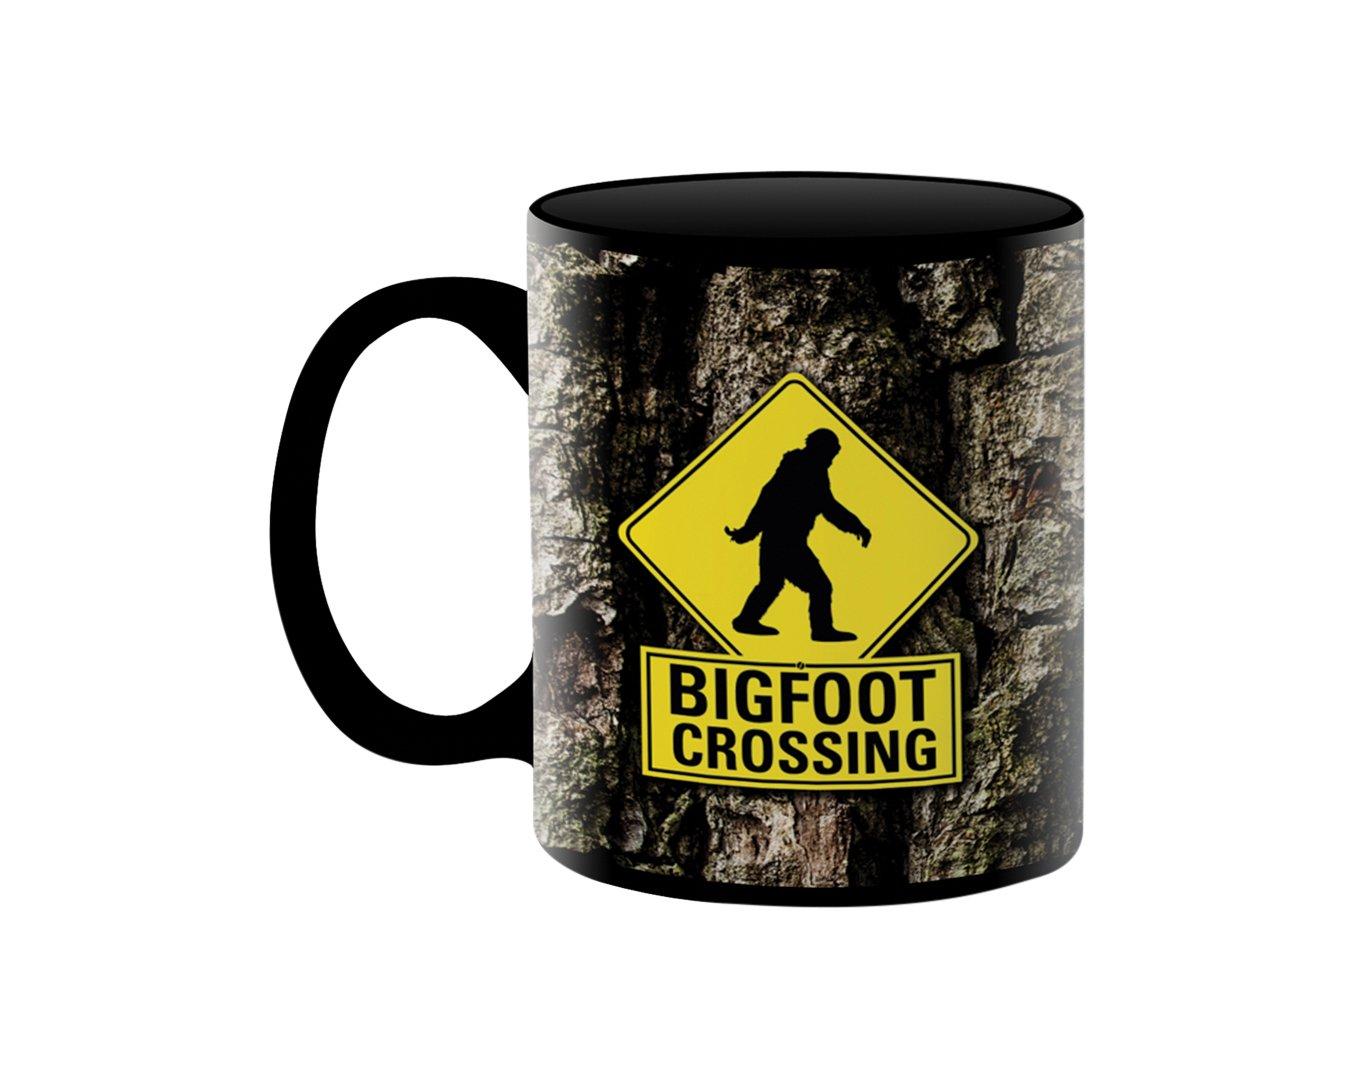 Bigfoot Crossing tazza in ceramica